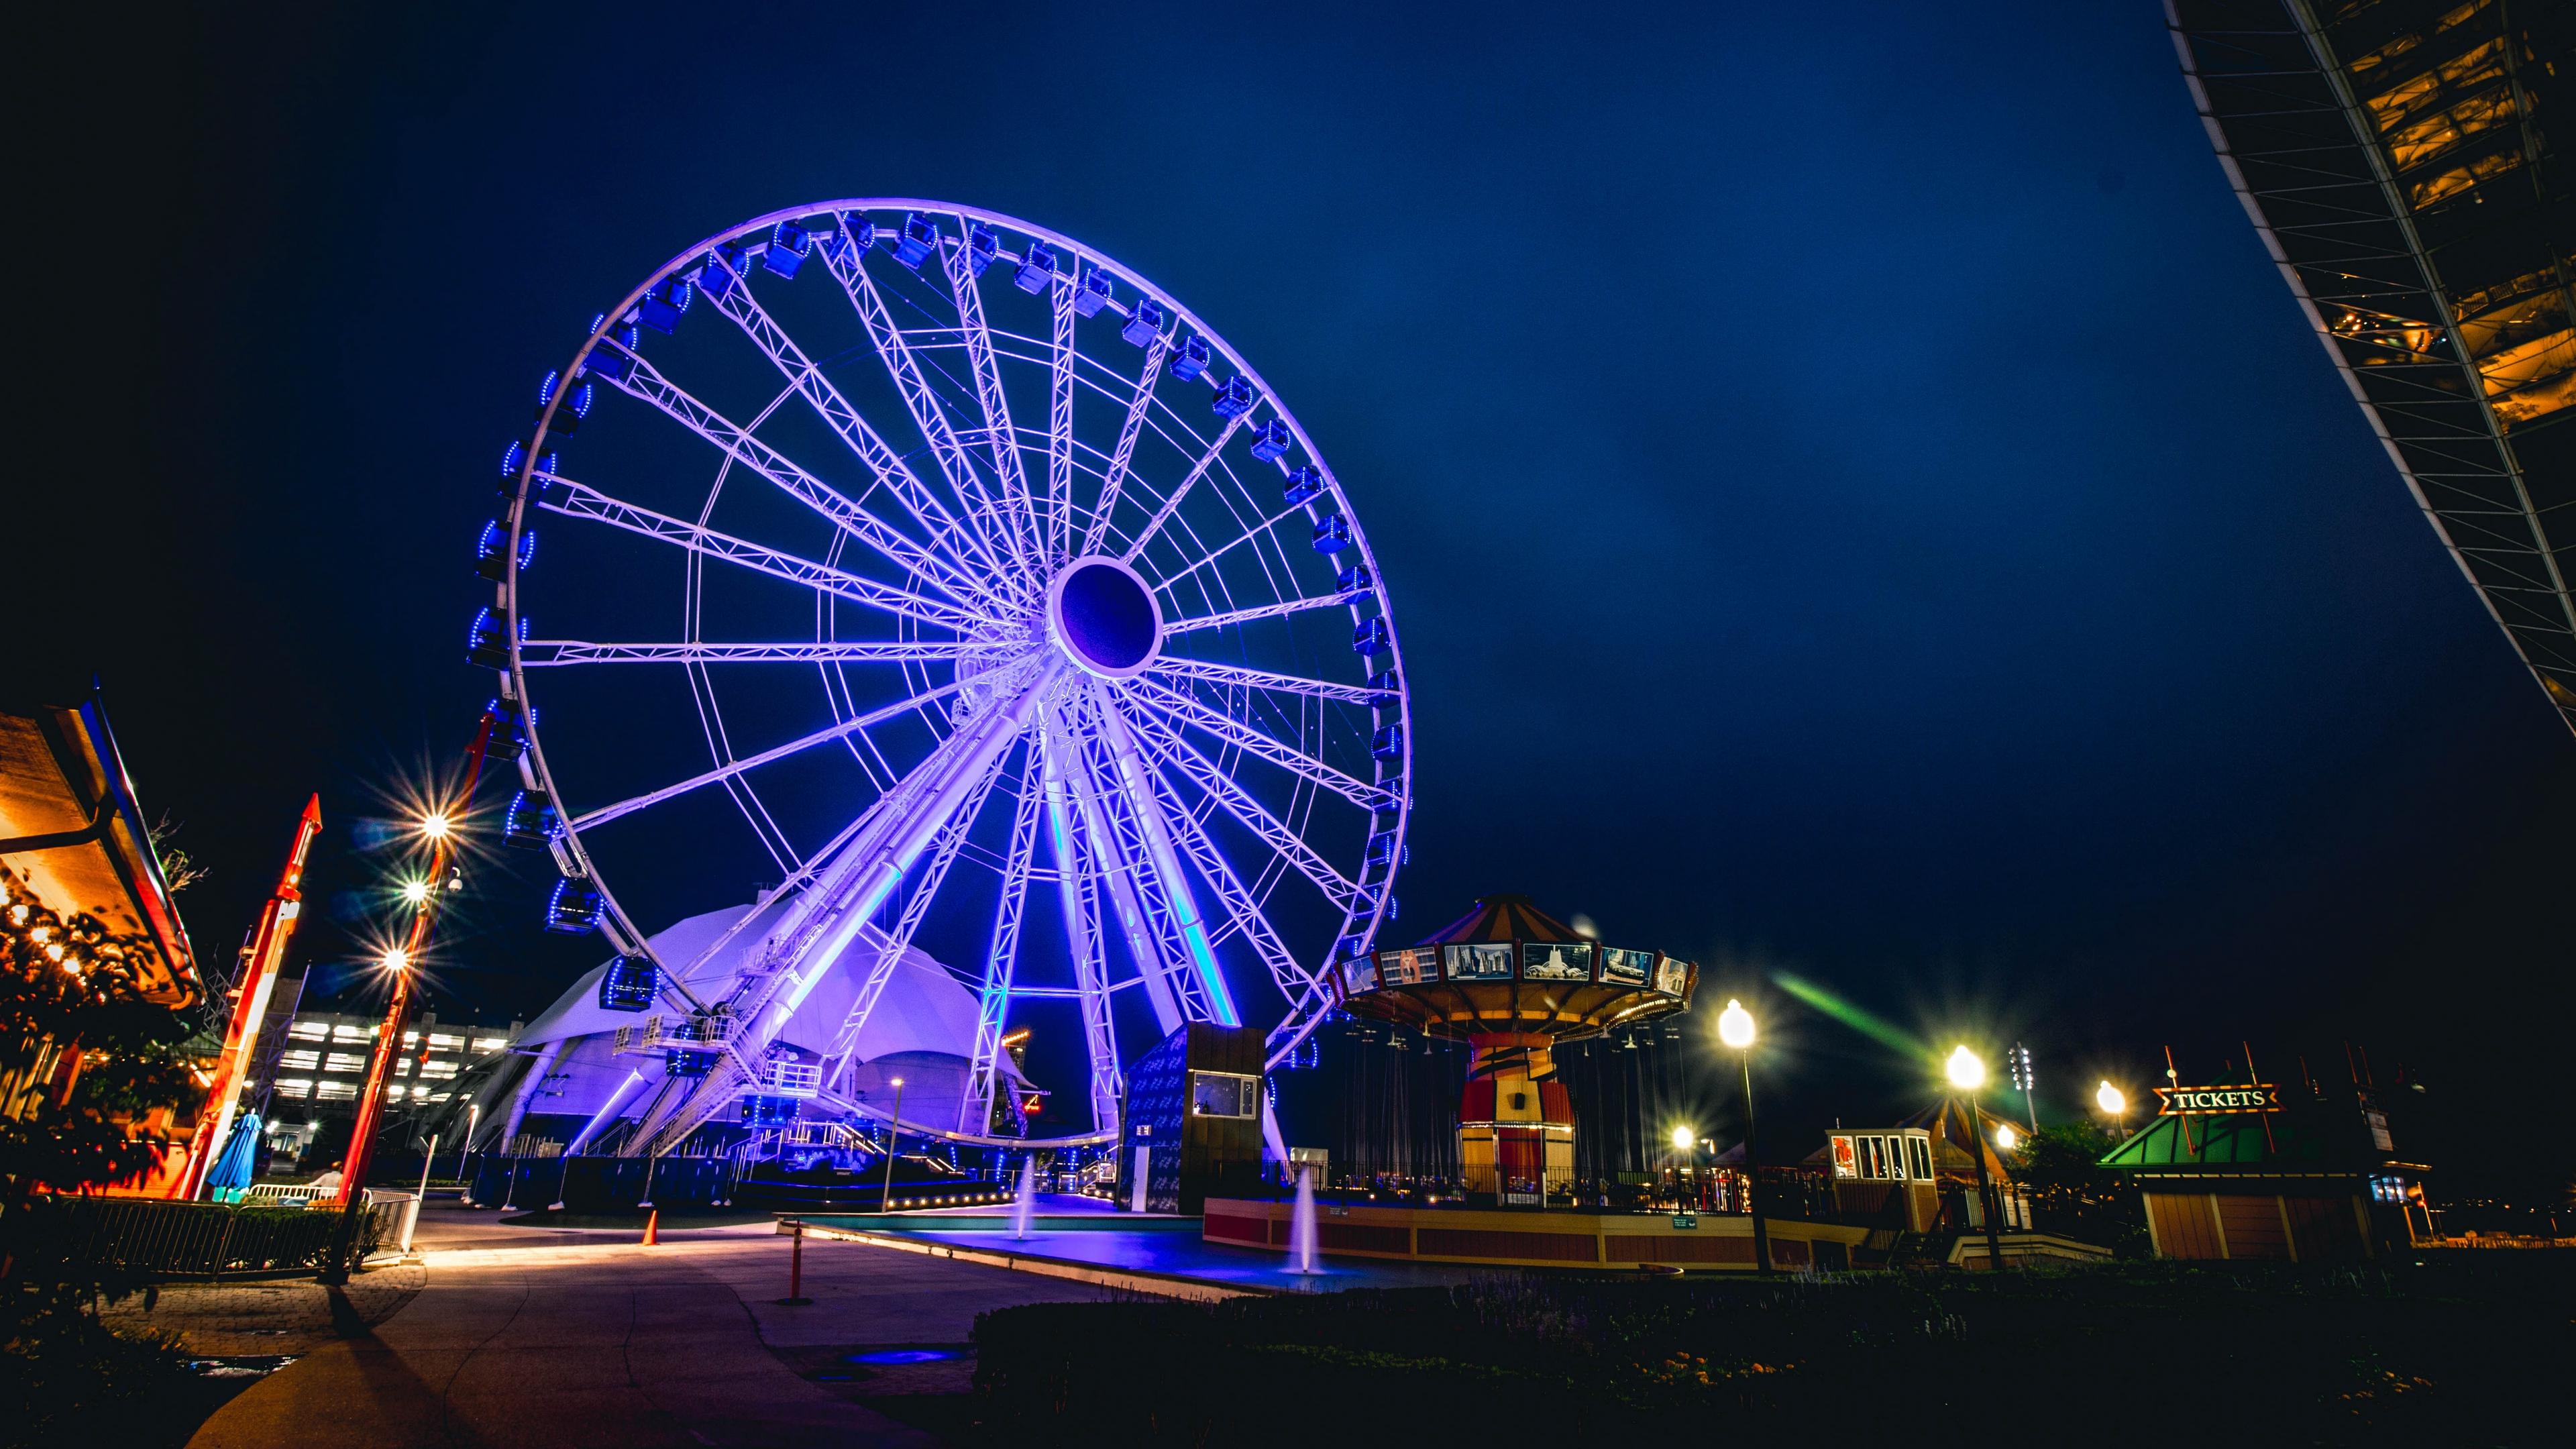 ferris wheel night light attraction 4k 1538065217 - ferris wheel, night, light, attraction 4k - Night, Light, ferris wheel